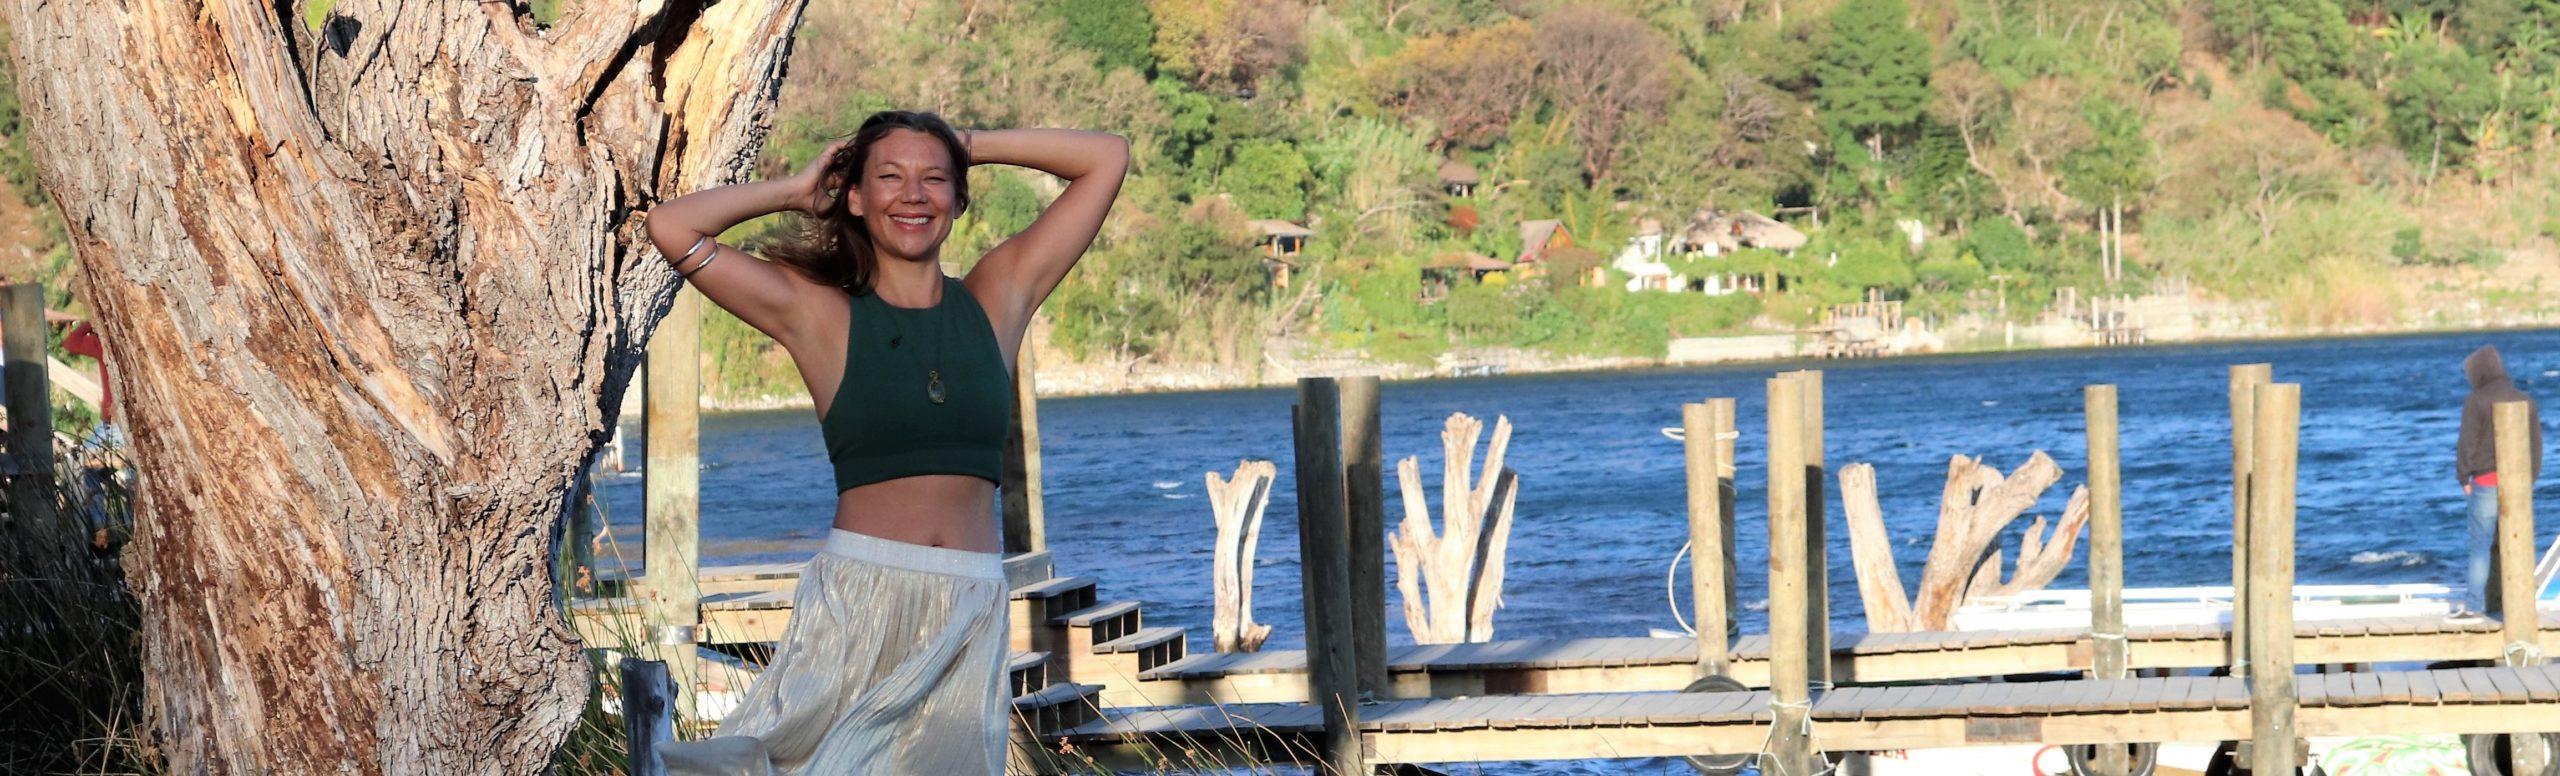 Melanie Wenzel @ Lago di Atitlan, Guatemala